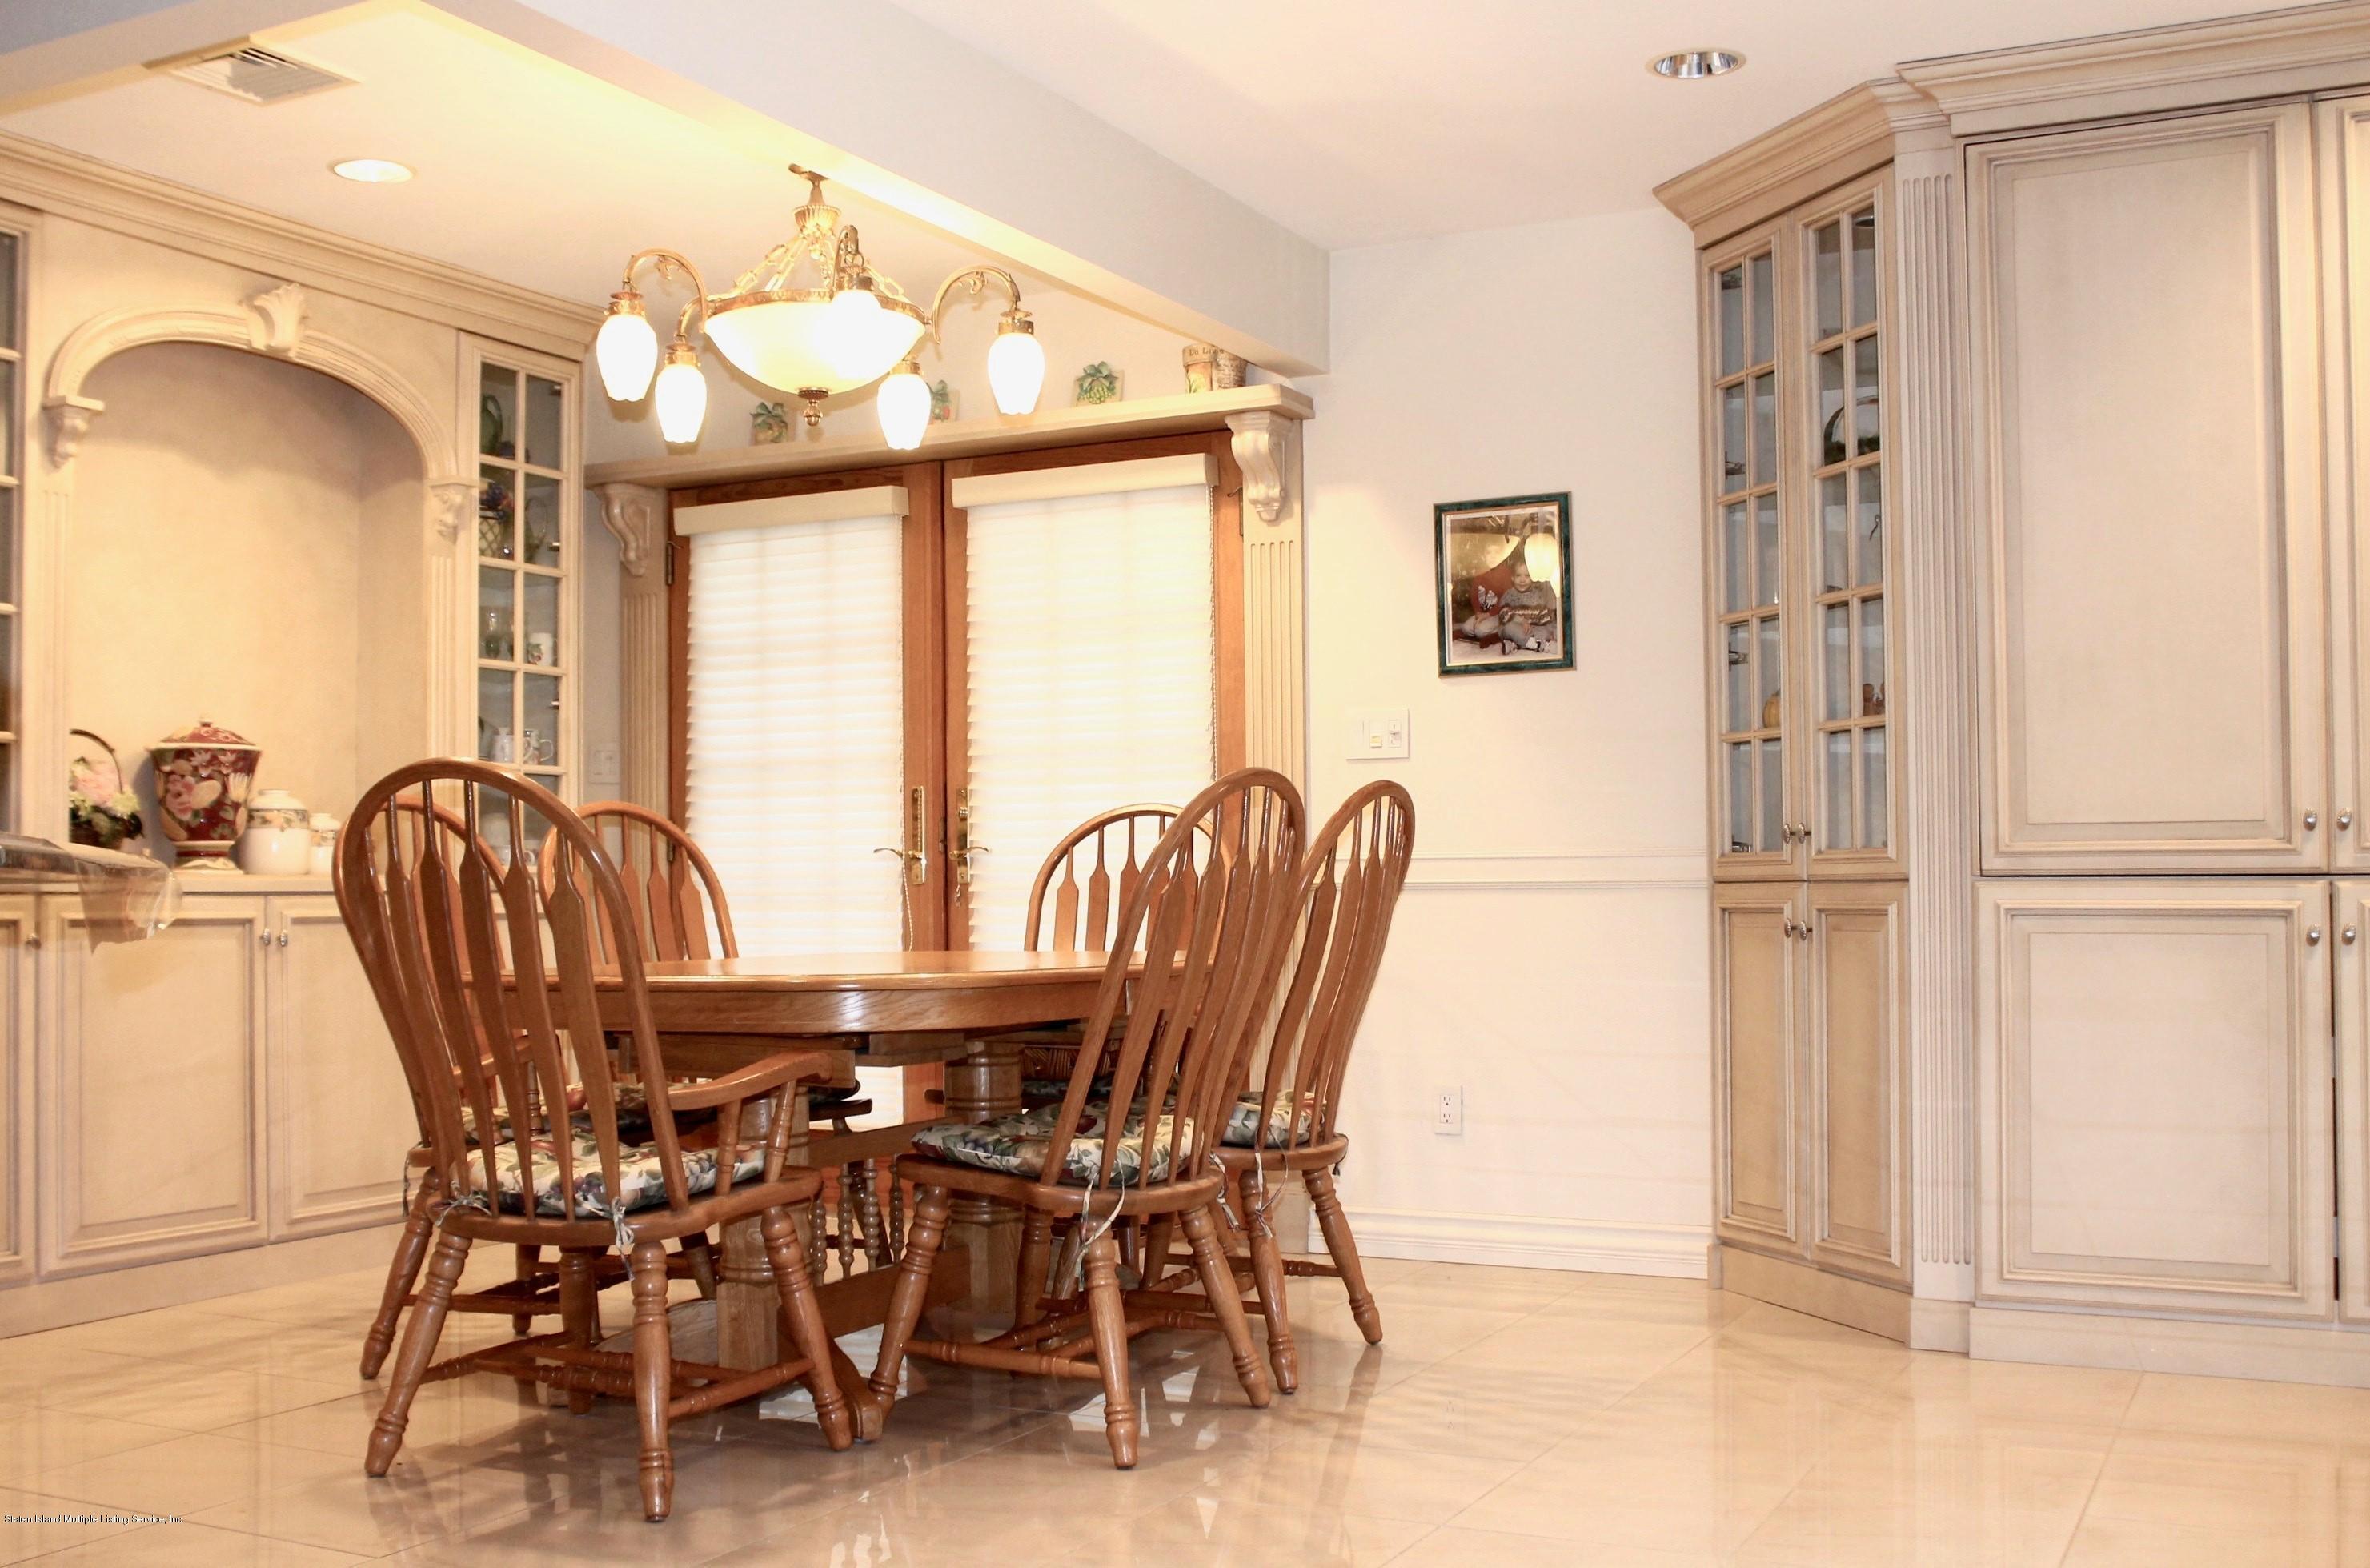 Single Family - Detached 55 Leslie Avenue  Staten Island, NY 10305, MLS-1125926-3